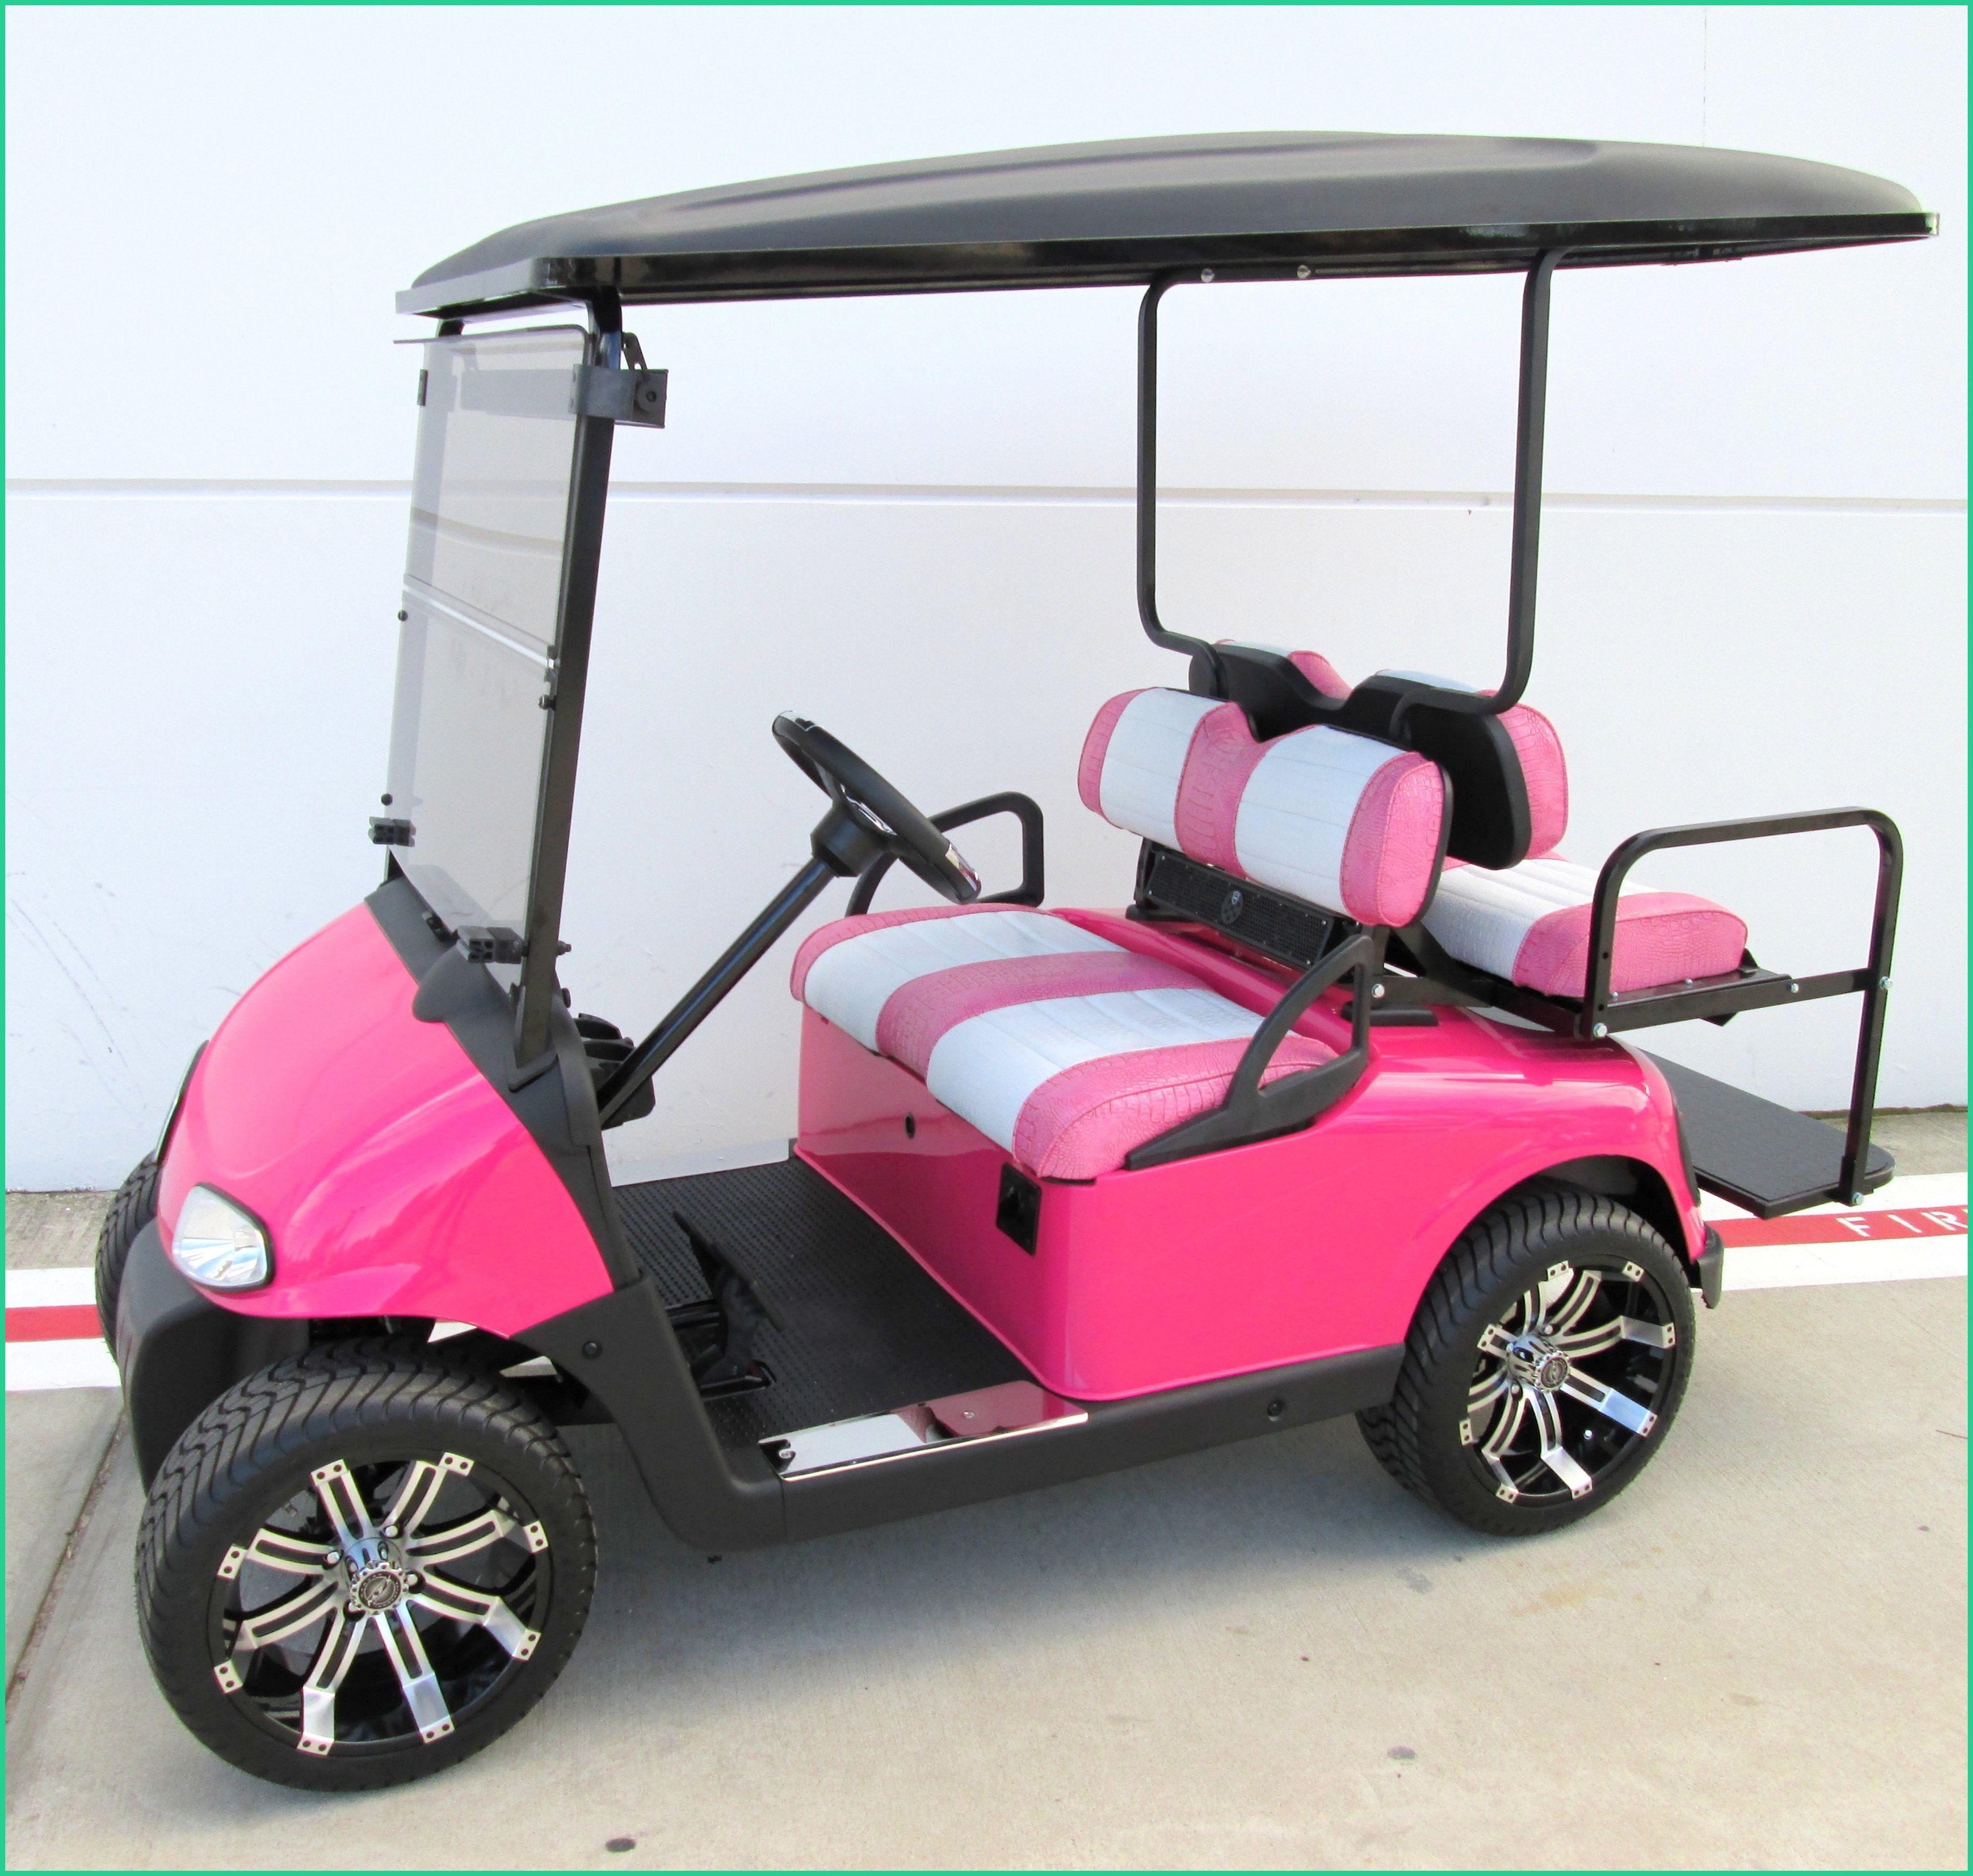 Golf Carts 9 Reason the Clicgear 3.0 Push Golf Cart Is